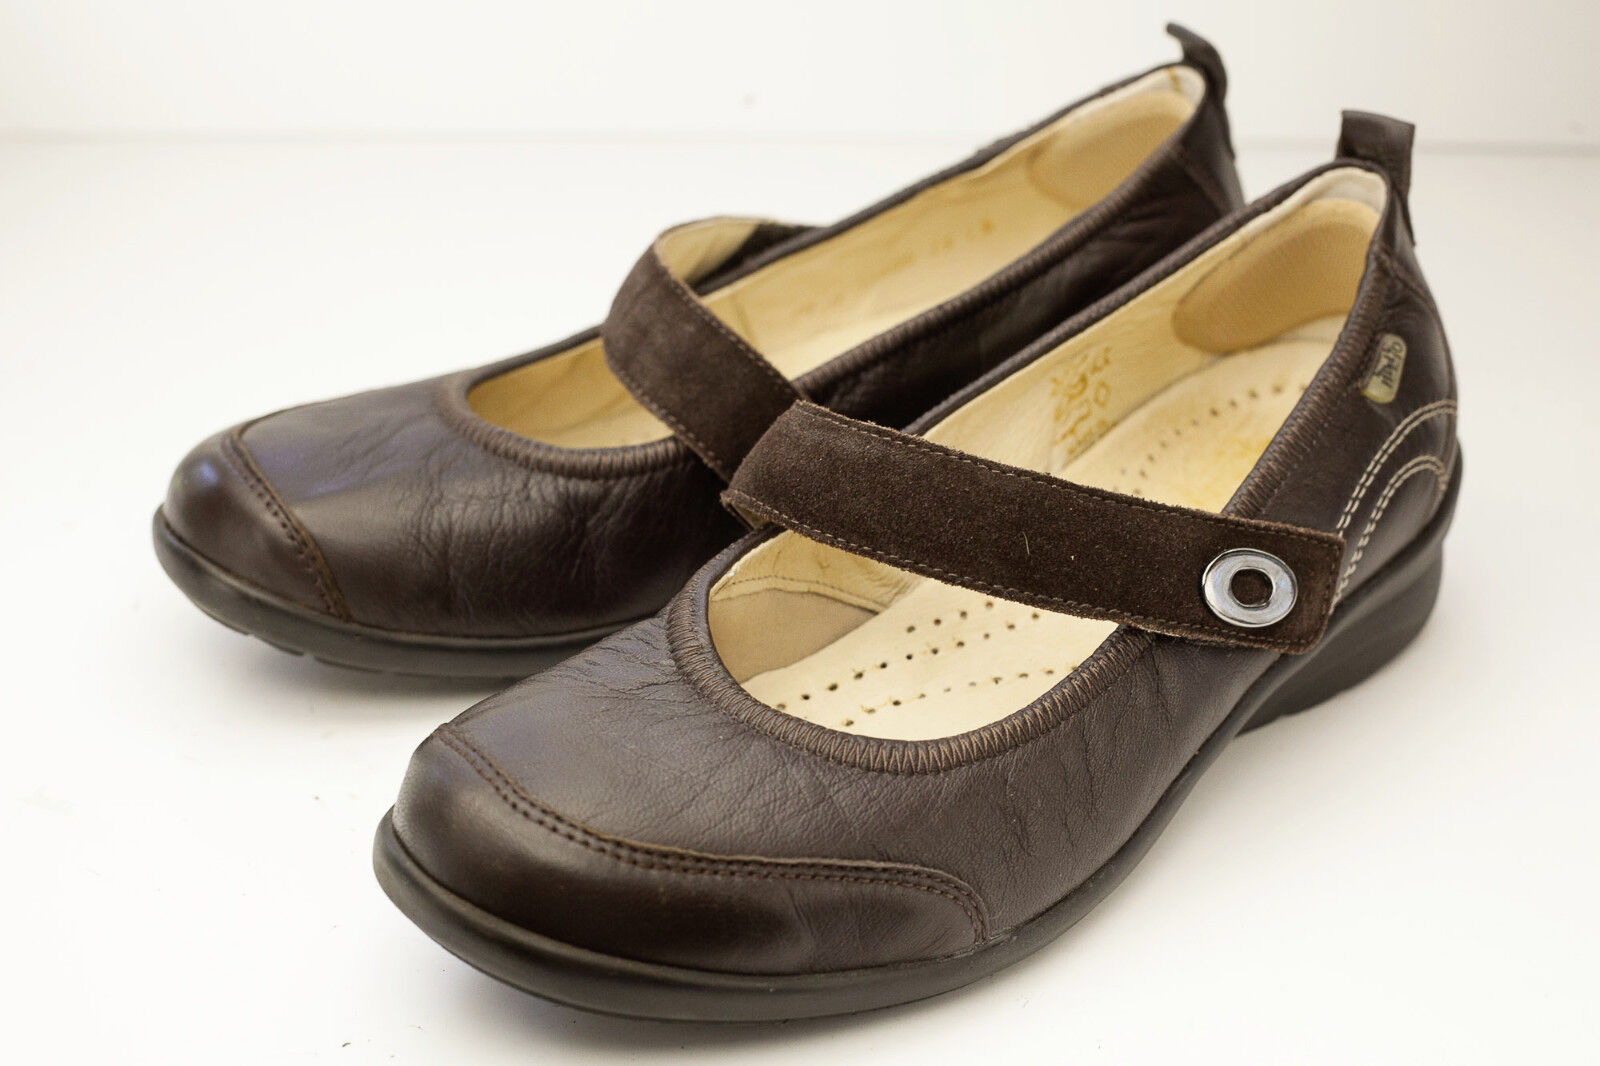 Fidelio Helga 7.5 Marrón Zapatos Para Mujer Mary Jane Jane Jane  de moda